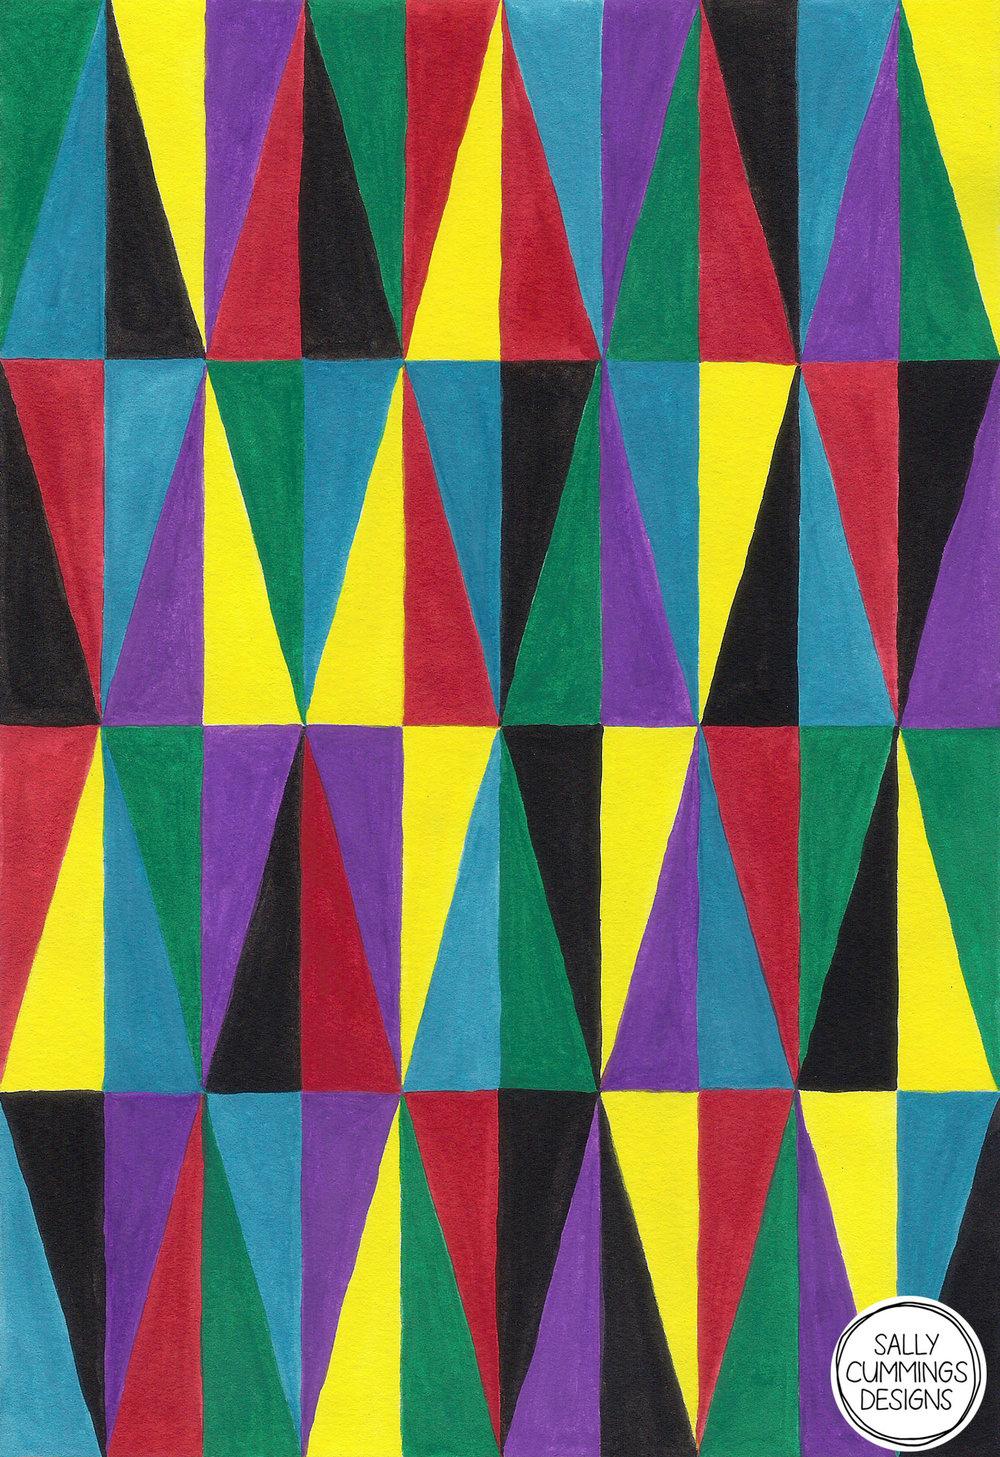 Sally Cummings Designs - Harlequin Pattern